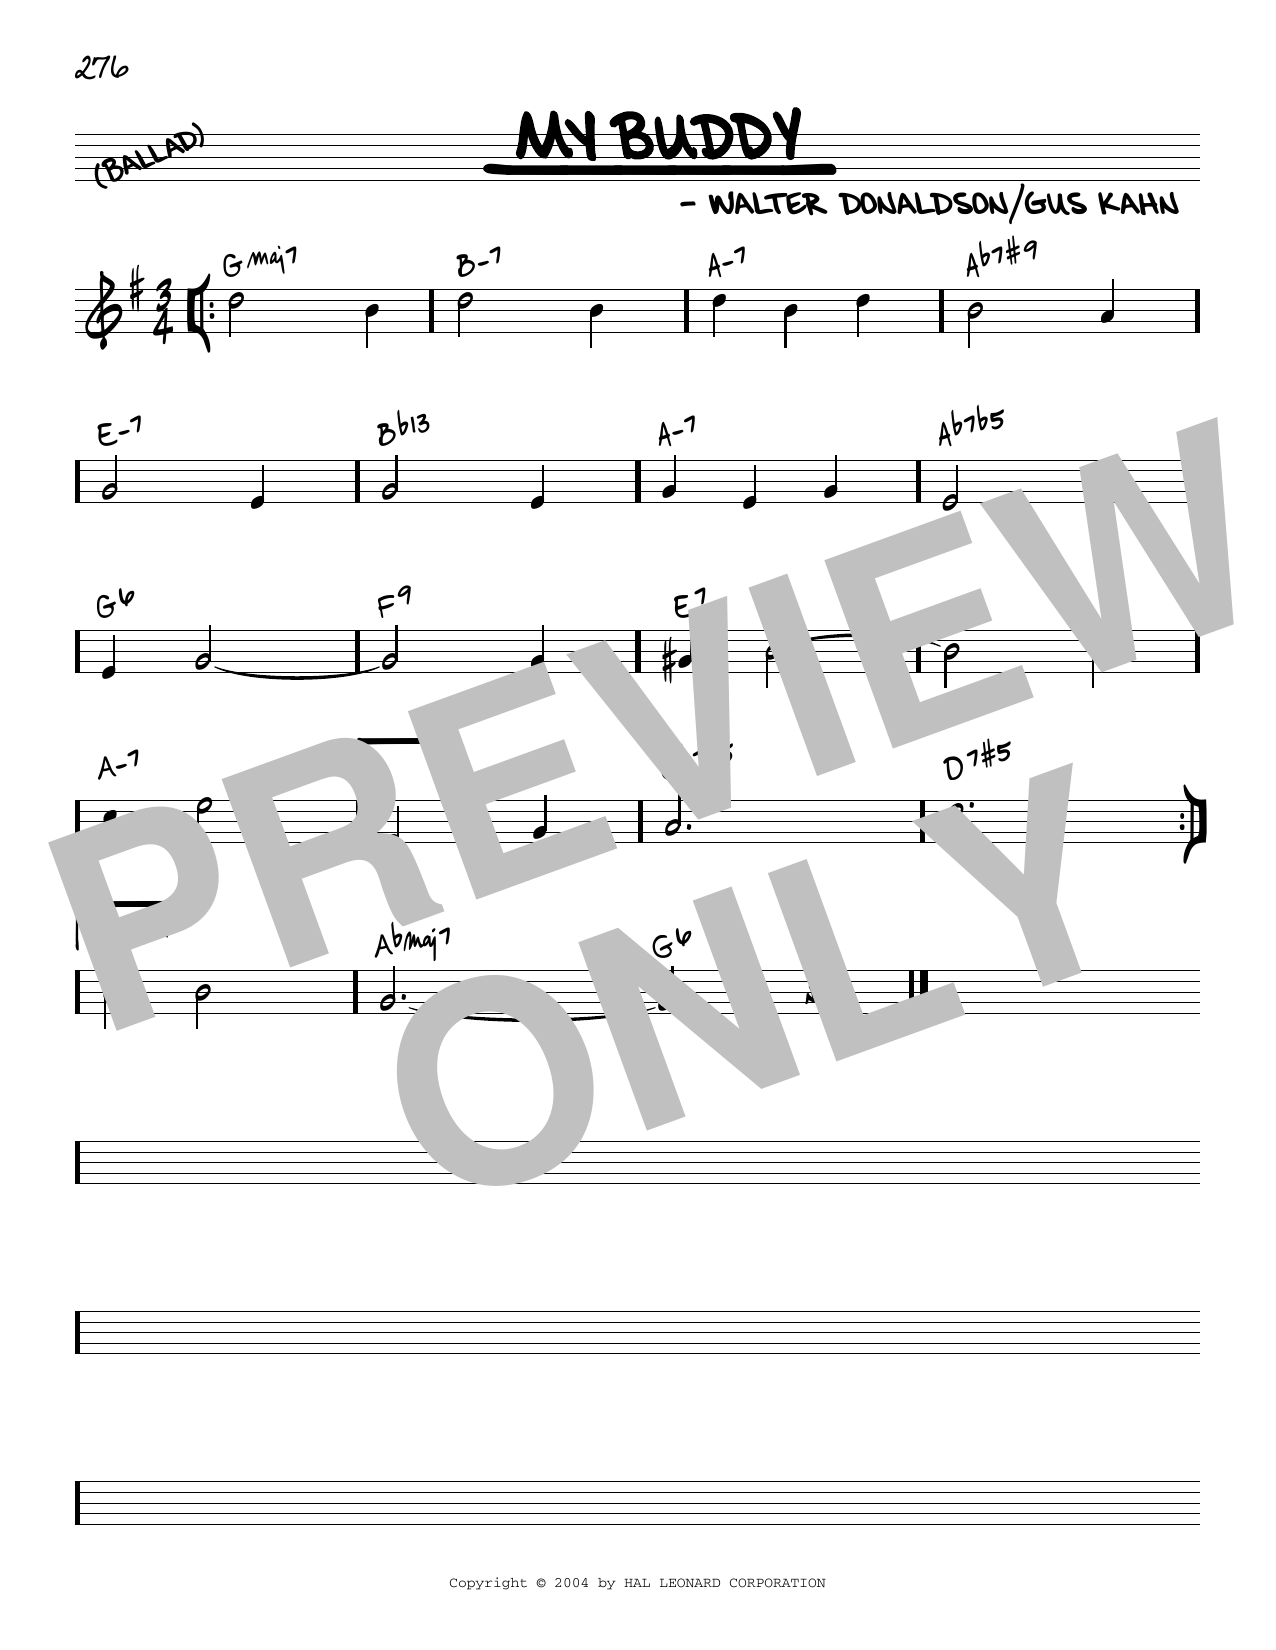 Walter Donaldson and Gus Kahn My Buddy [Reharmonized version] (arr. Jack Grassel) sheet music notes printable PDF score